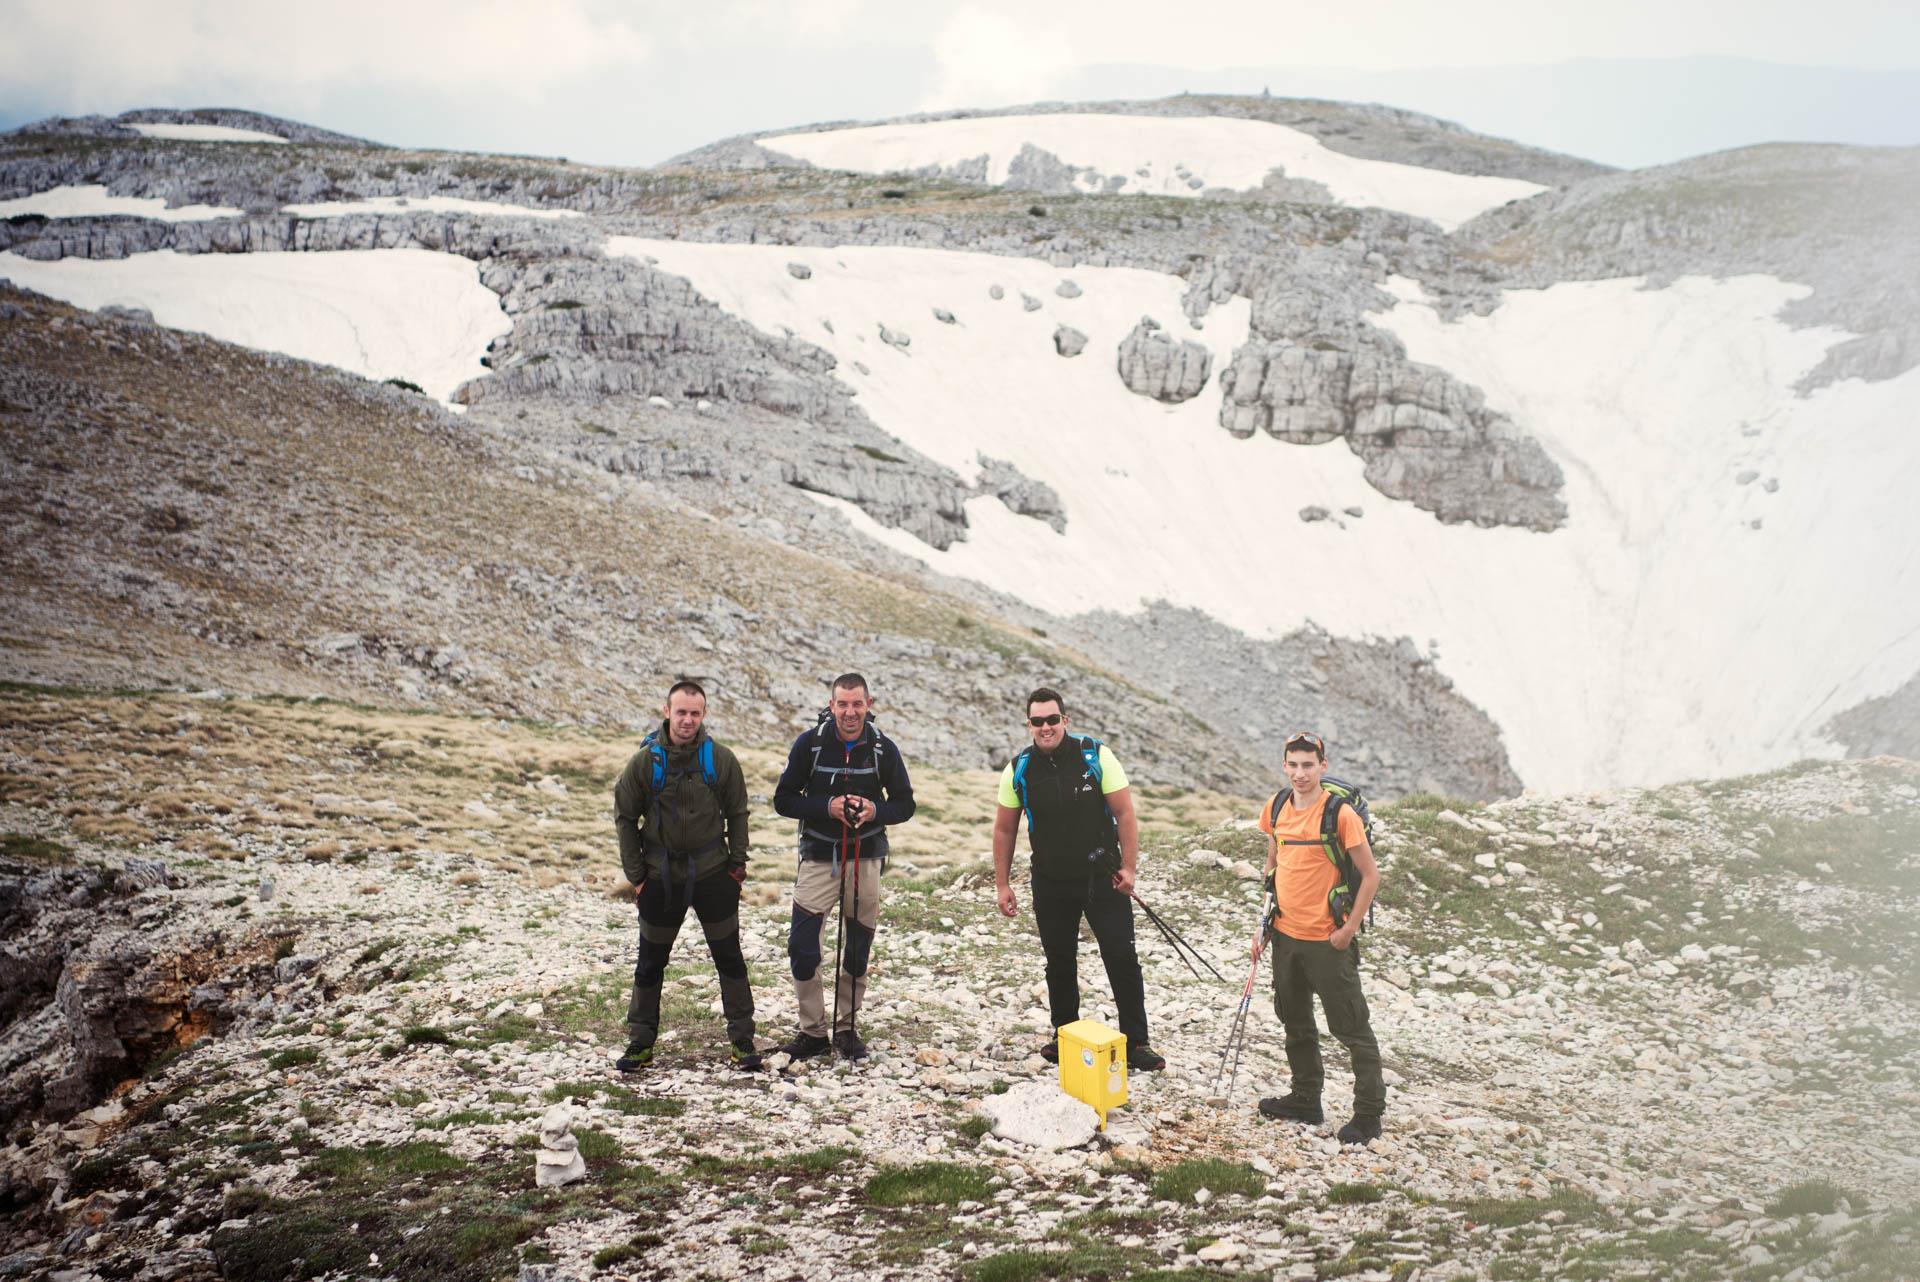 04062017-planinari-plocno6